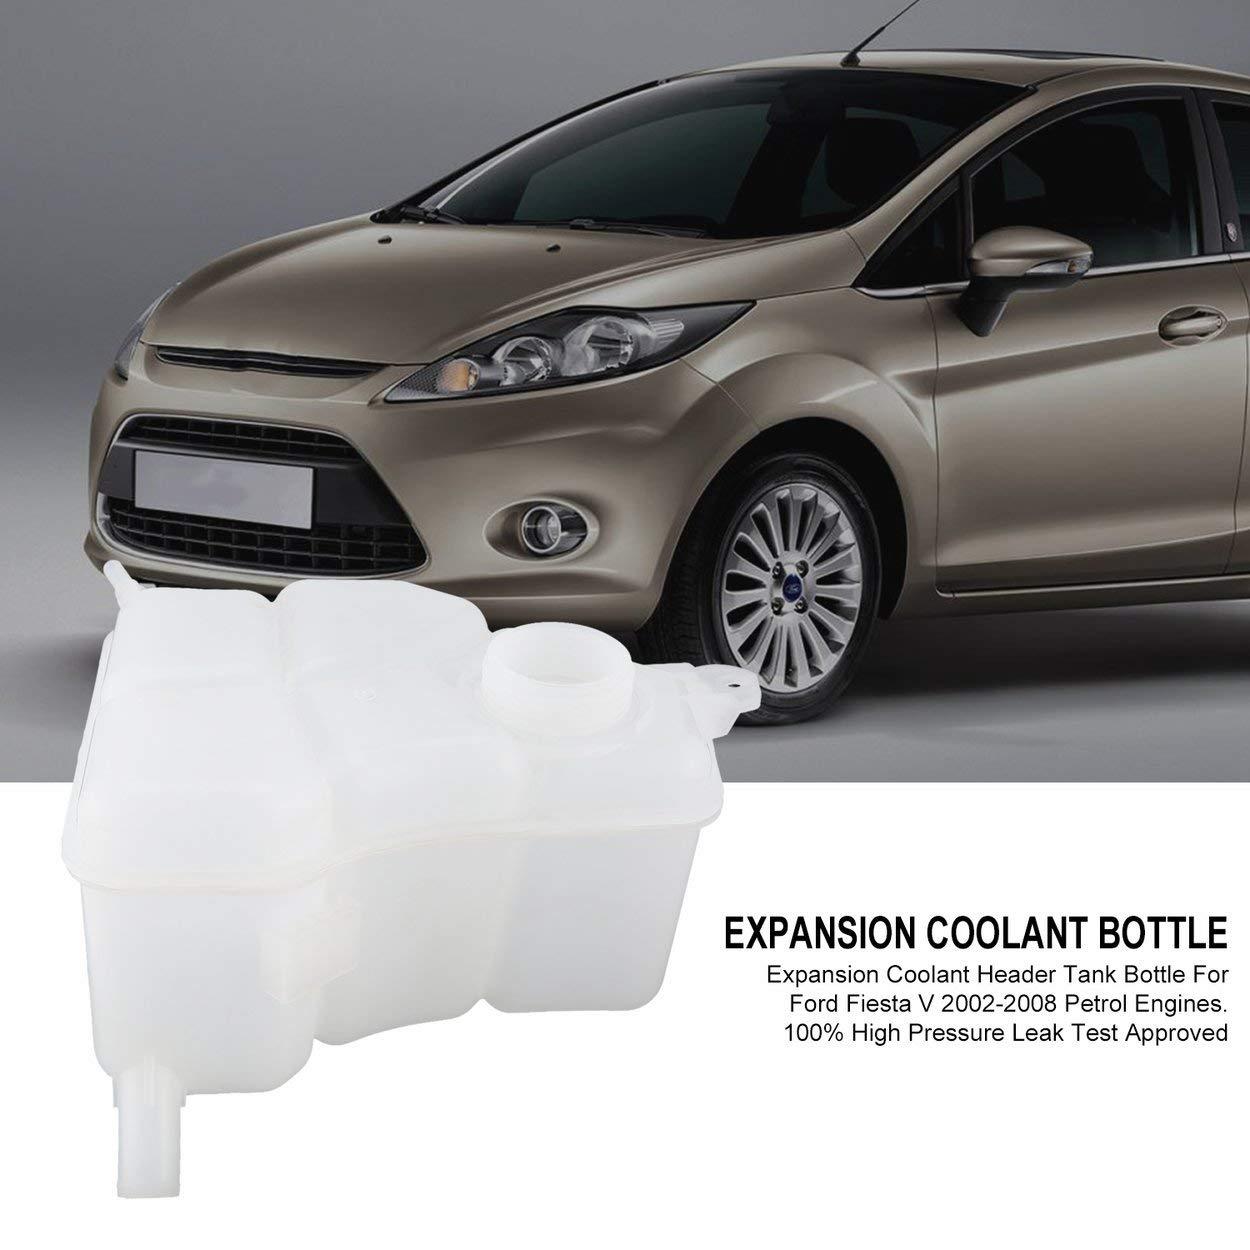 Lorenlli Expansi/ón del Coche Botella de Tanque de Agua del refrigerante para Ford Fiesta V 2002-2008 Motores de Gasolina 1221362 1141512 2s6h-8k218